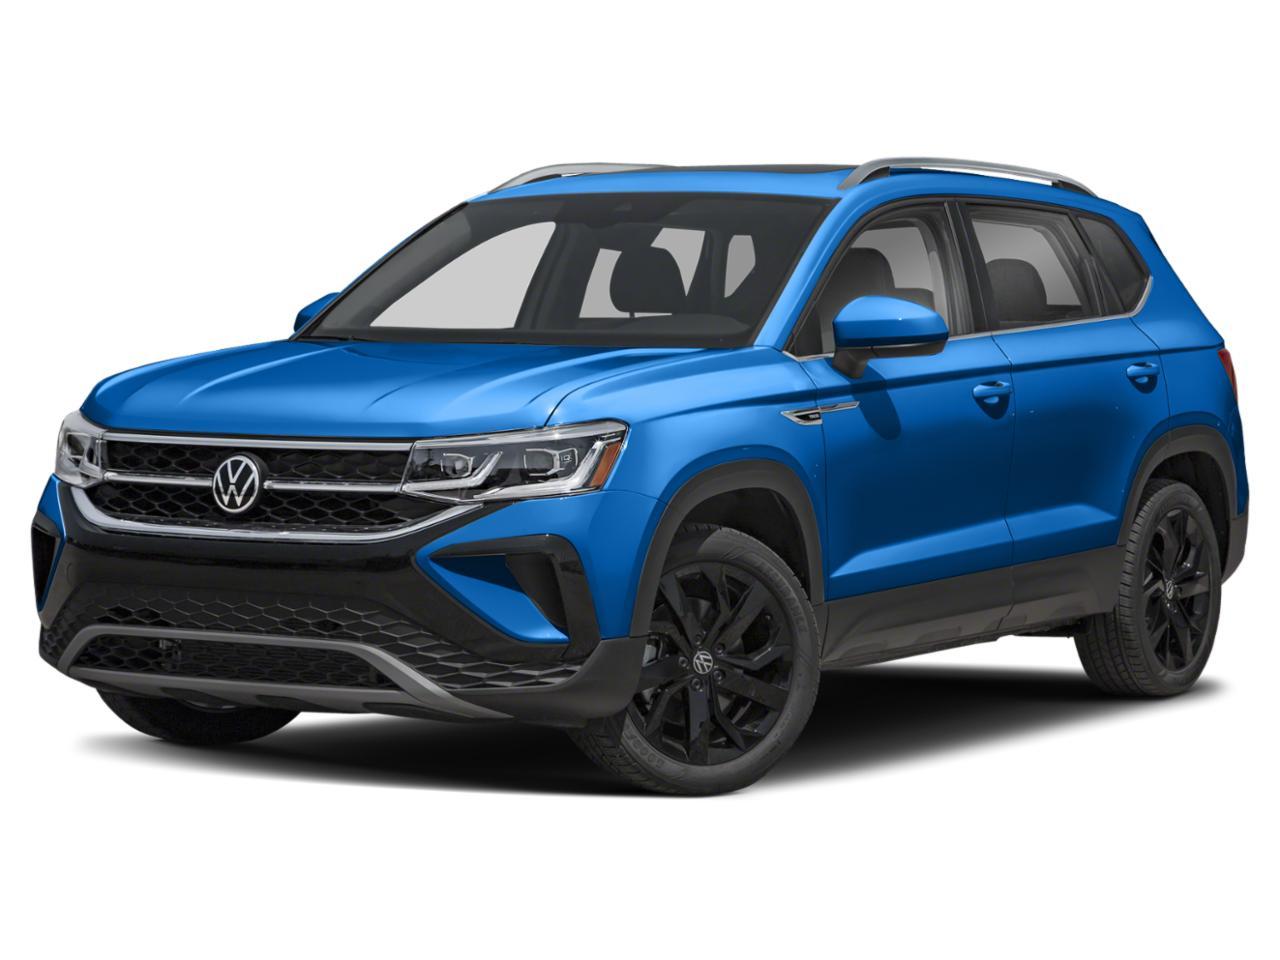 2022 Volkswagen Taos Vehicle Photo in San Antonio, TX 78257